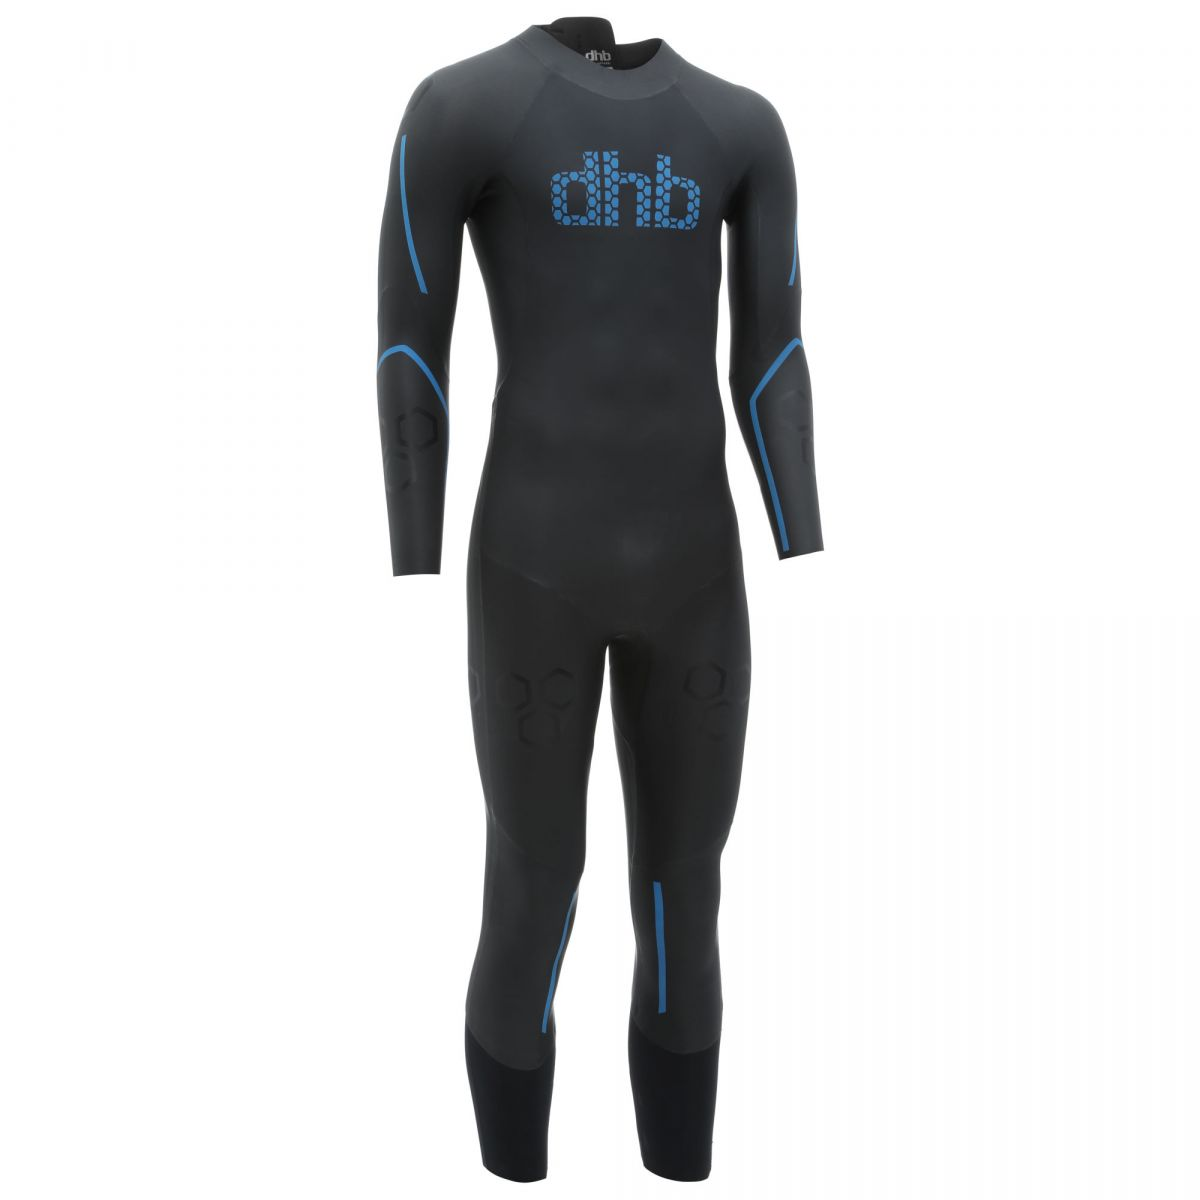 dhb-Aeron-Wetsuit-men-front